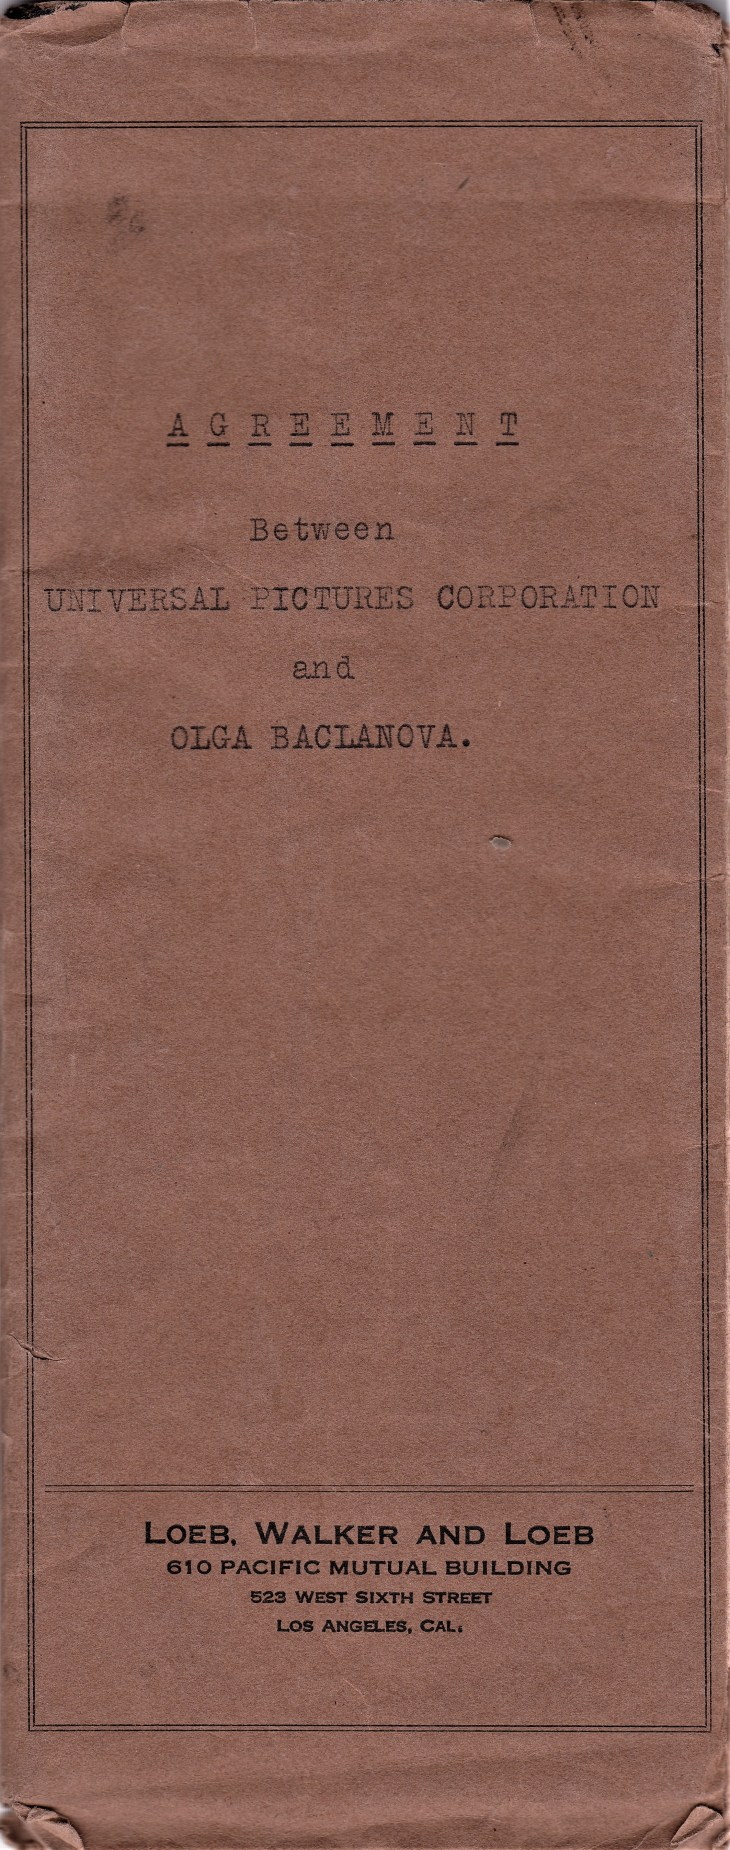 Universal Baclanova contract cover